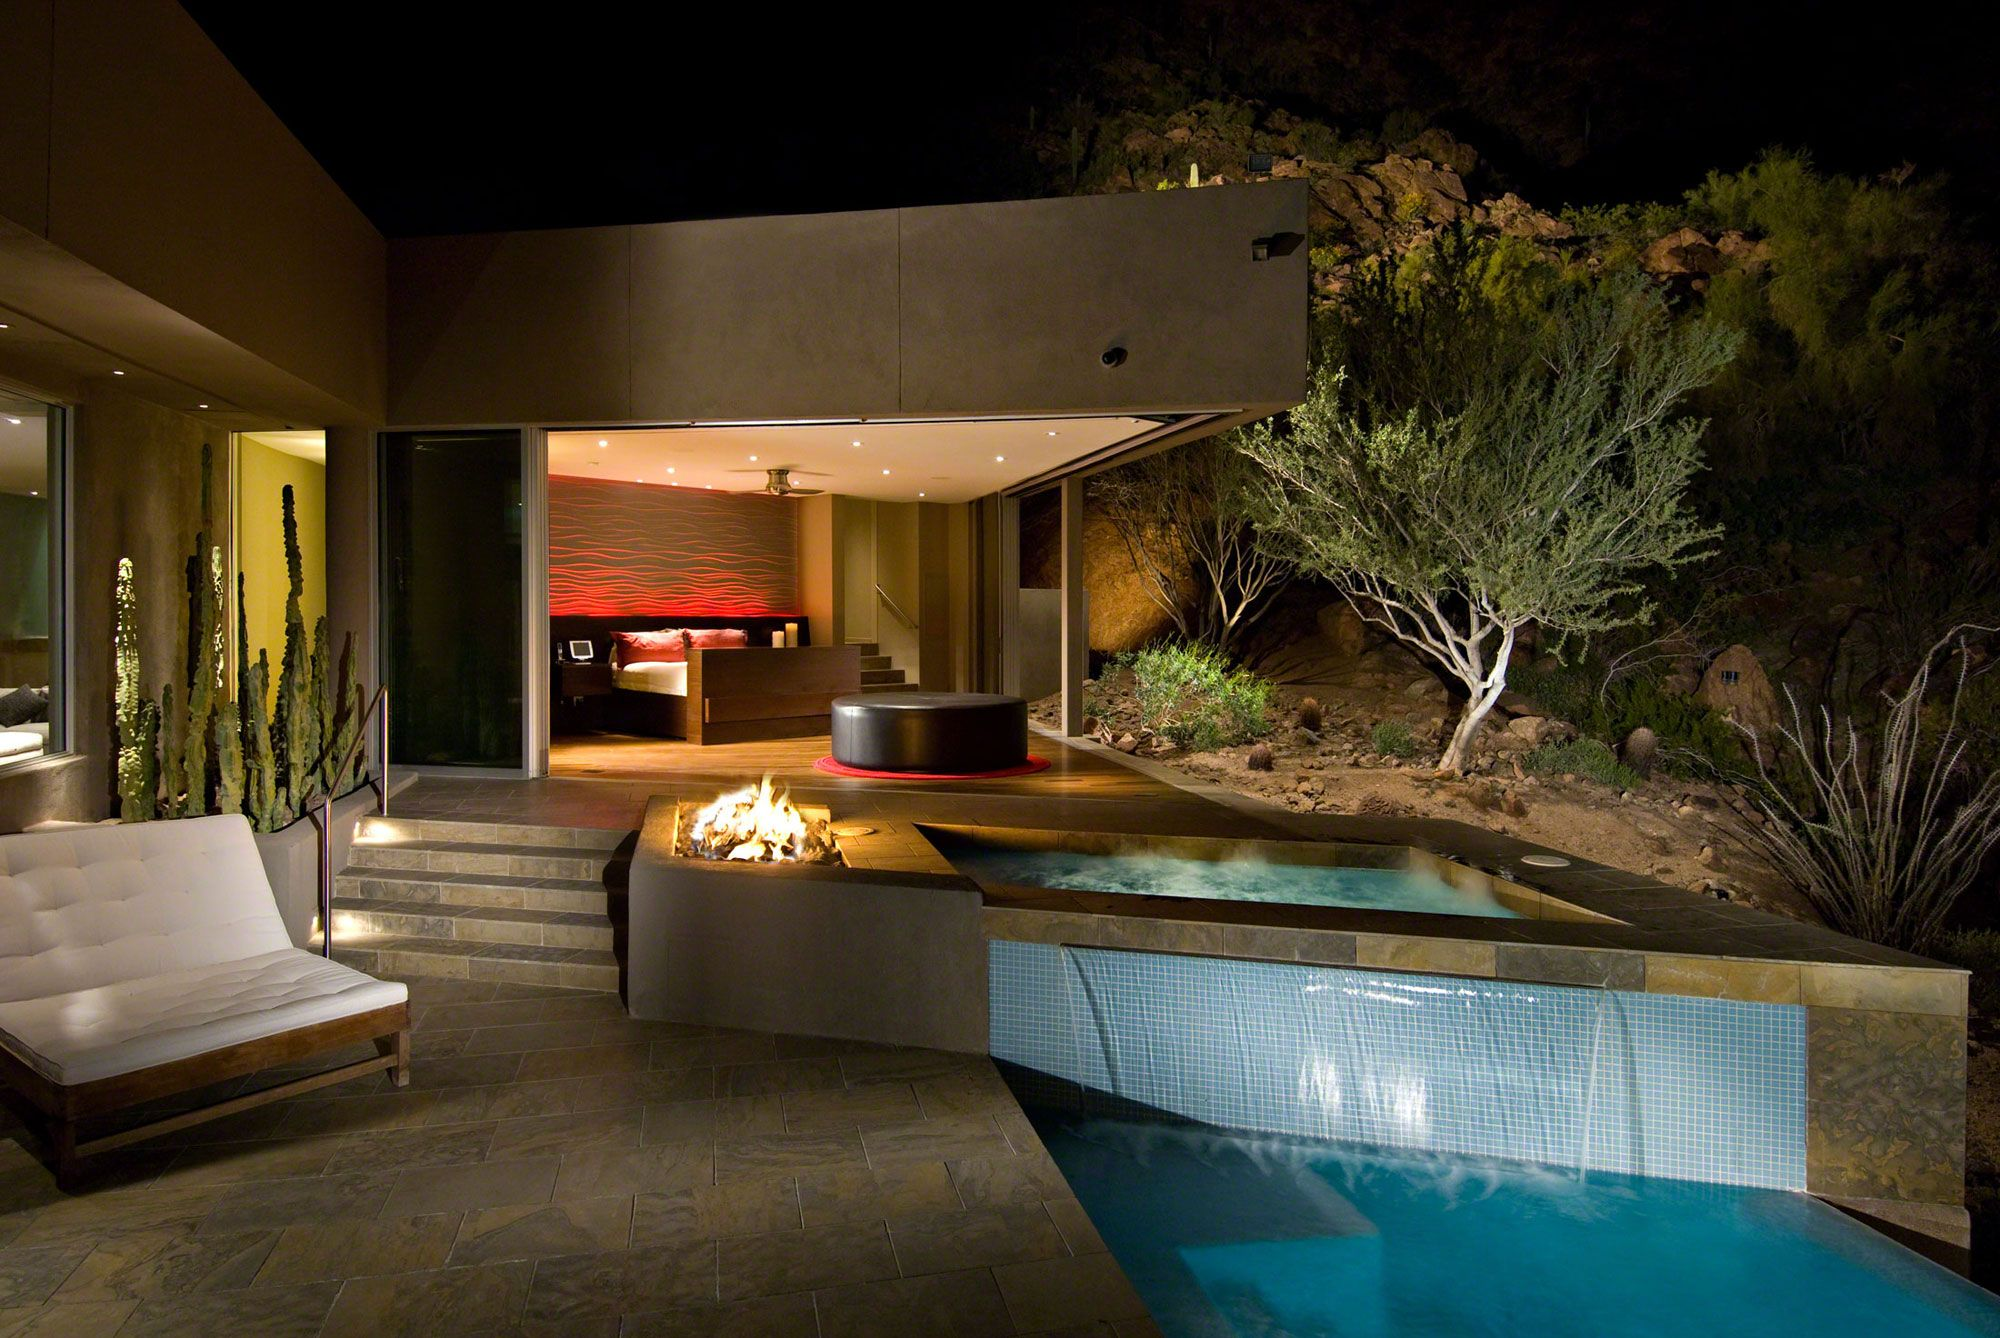 Best Kitchen Gallery: Nightime Illumination Az Exterior Pinterest Paradise Valley of Scottsdale Arizona Home Builder on rachelxblog.com